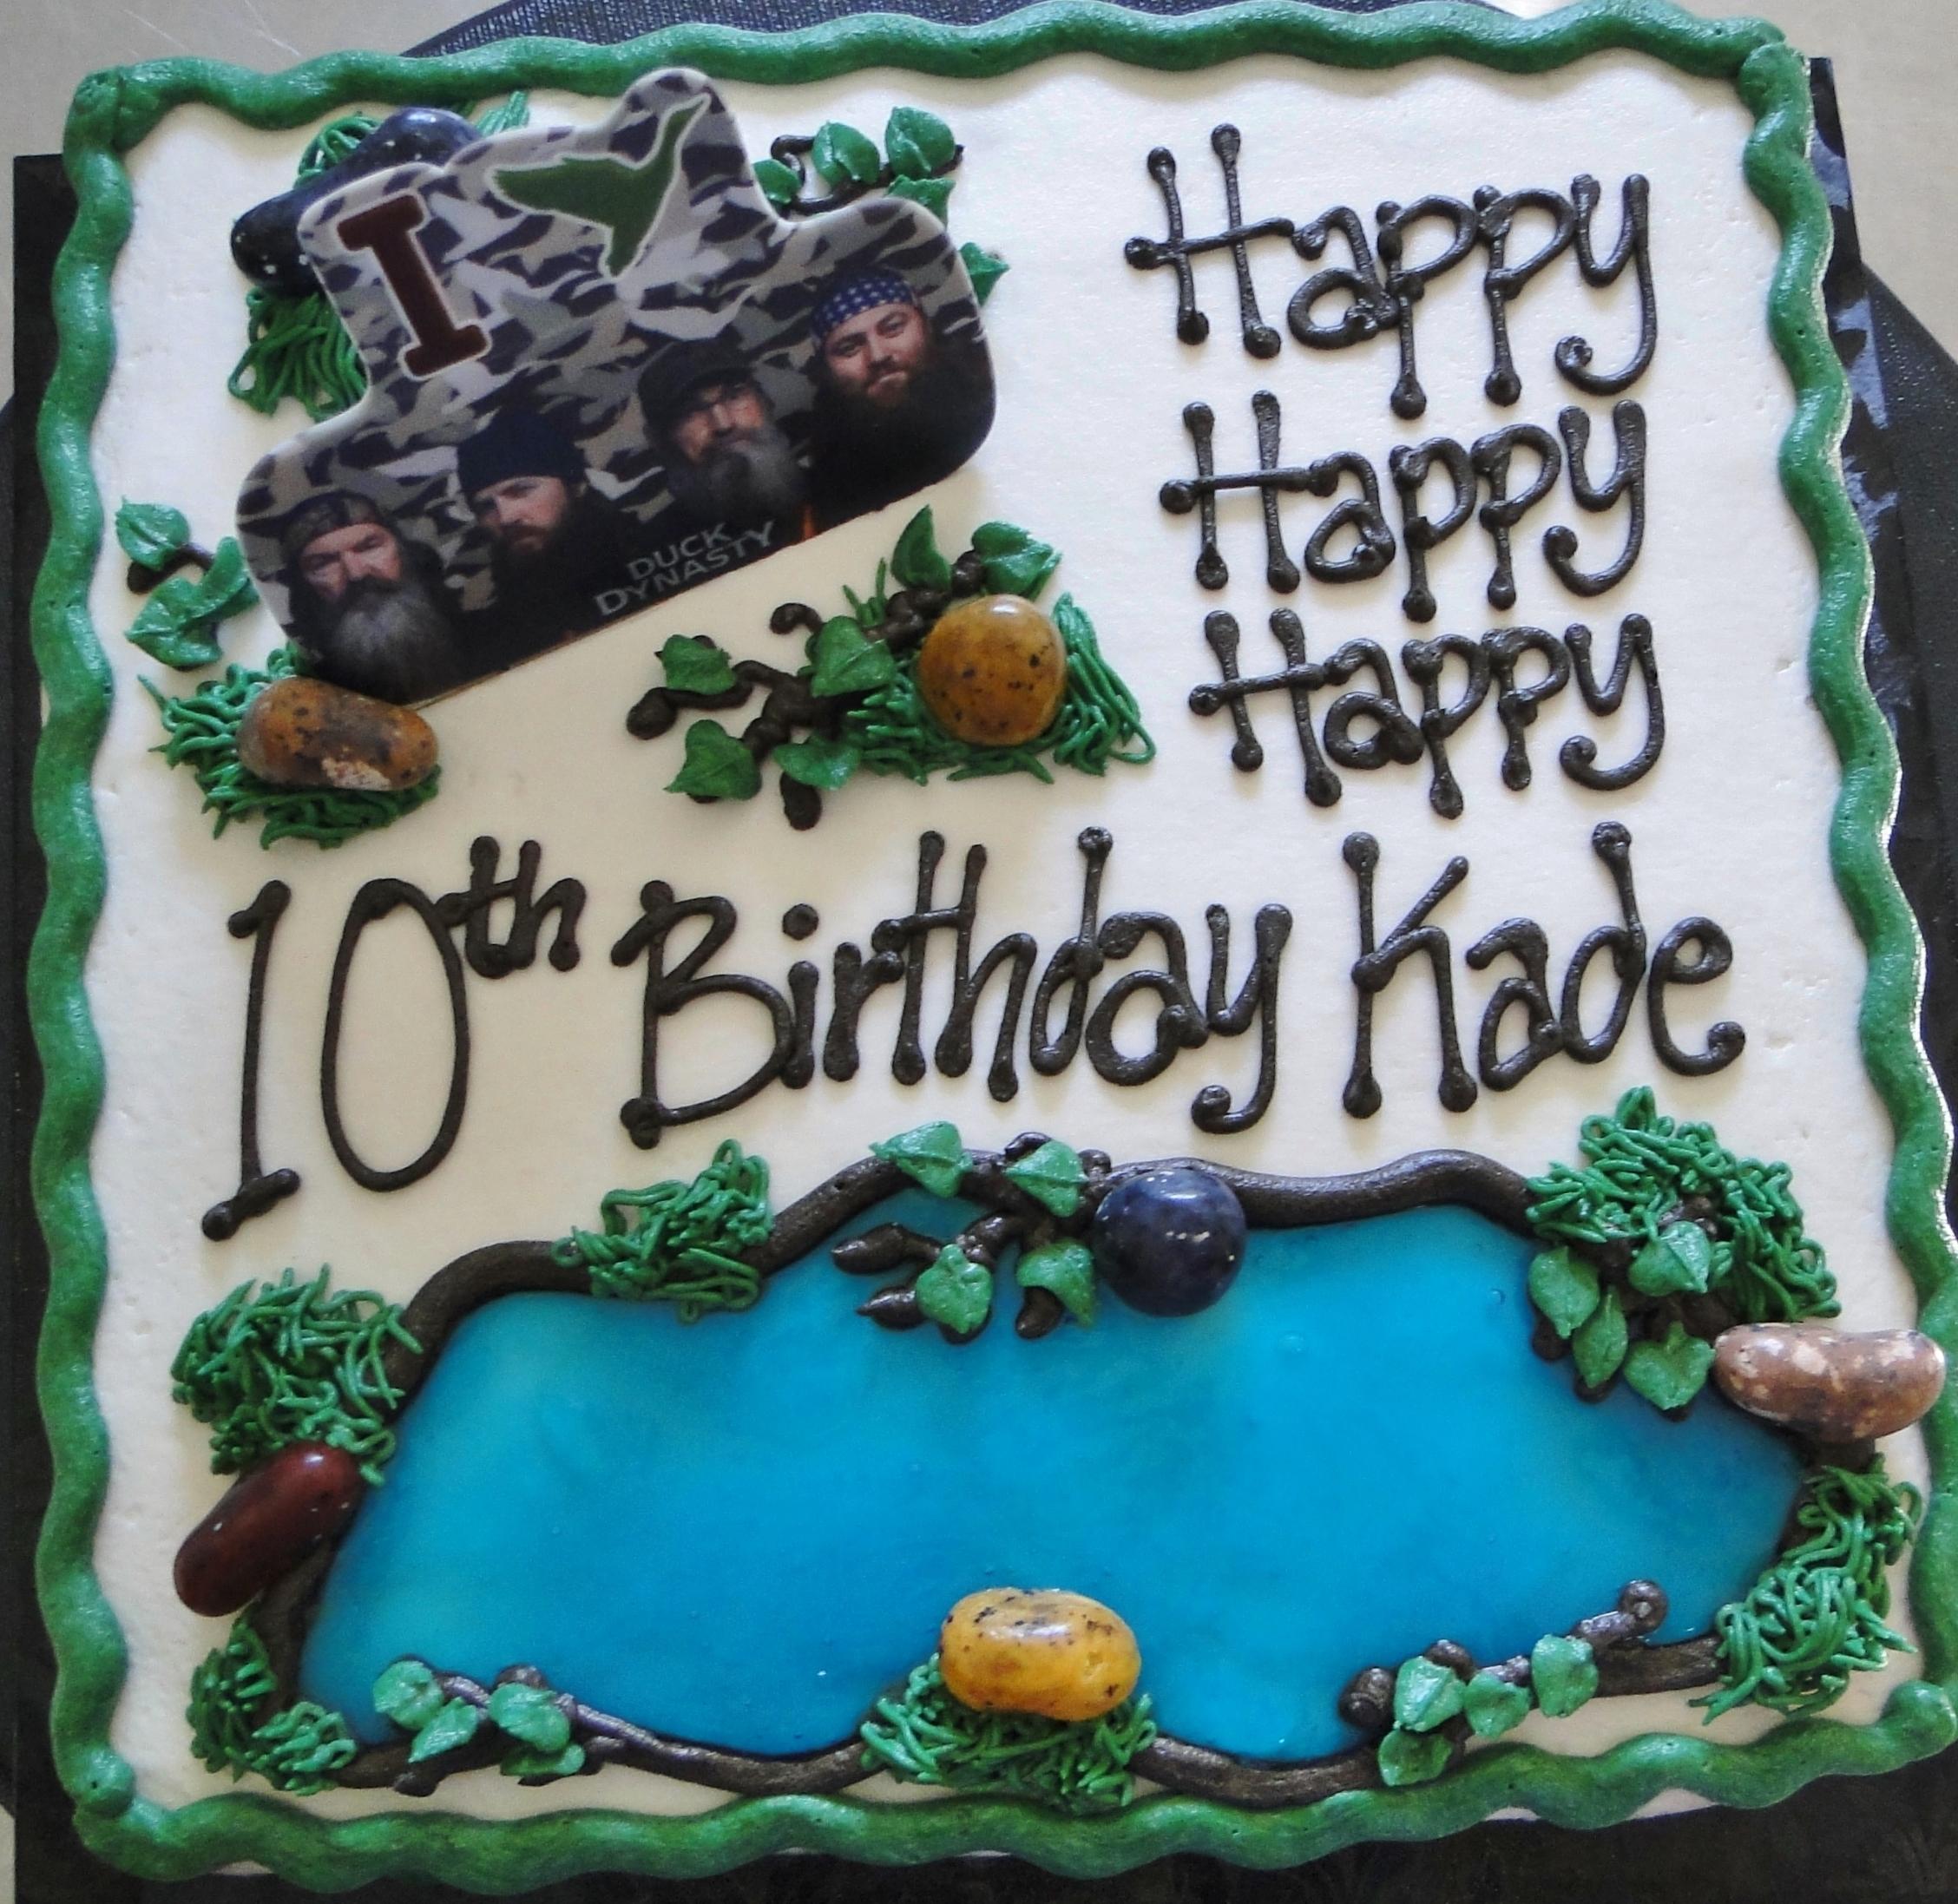 Tremendous Duck Dynasty Cake The Swirl Cakes Personalised Birthday Cards Veneteletsinfo